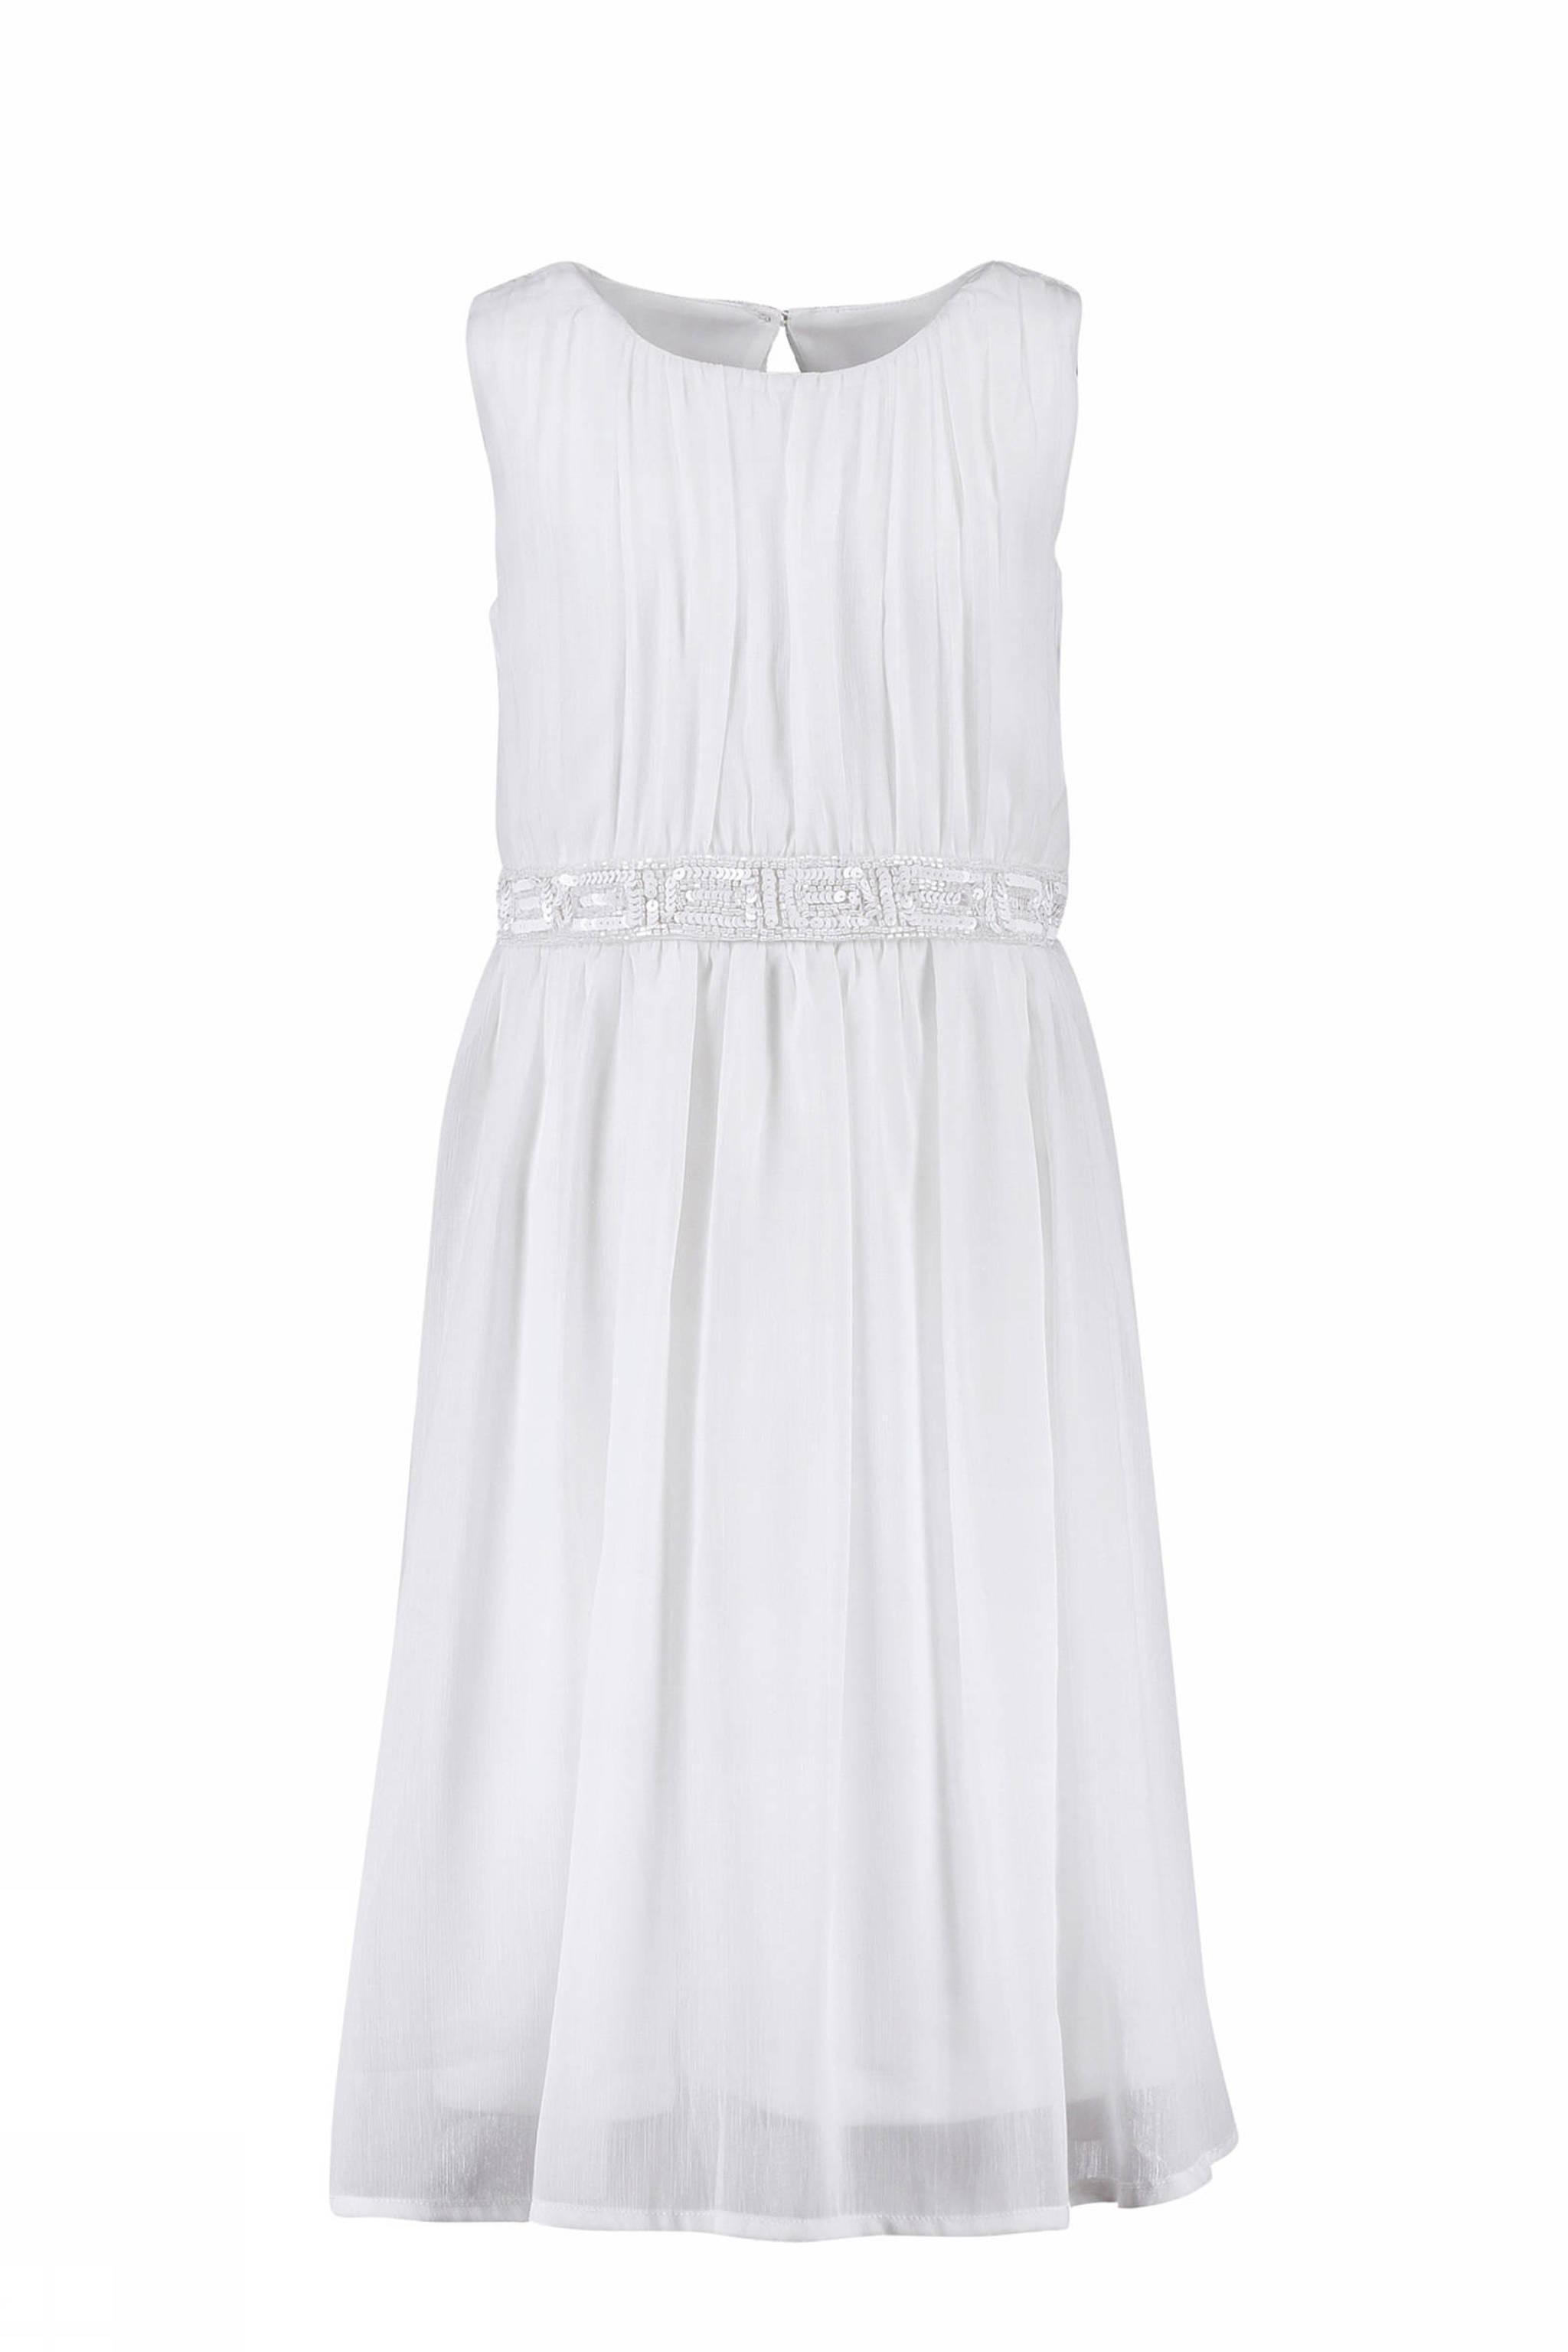 3613366267d961 CKS KIDS jurk Nitara met pailletten wit